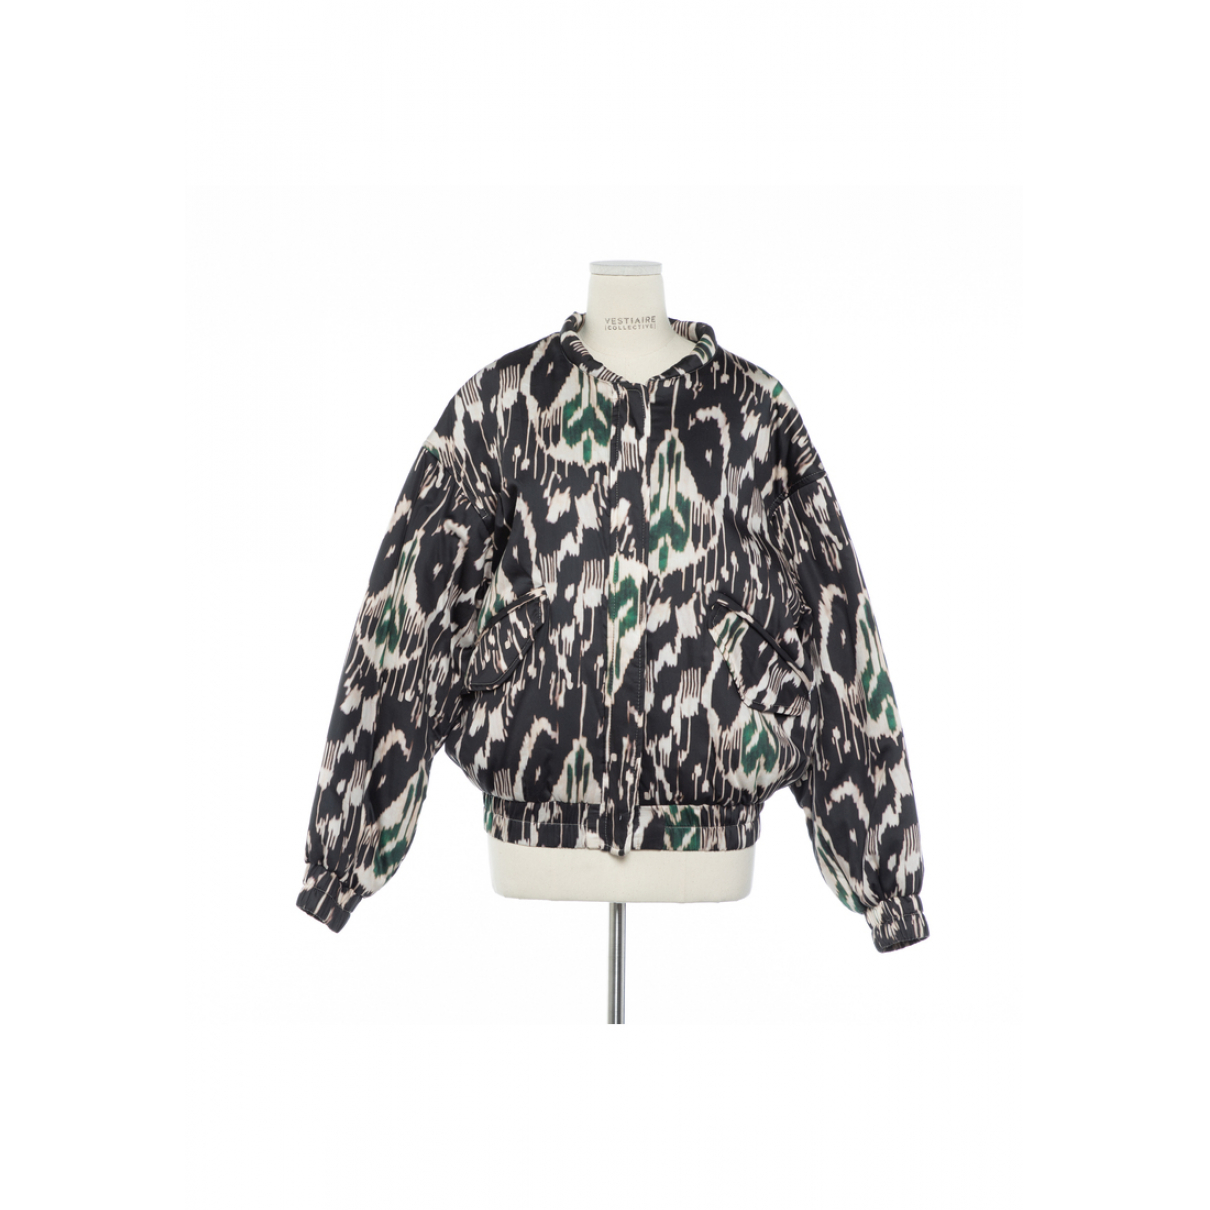 Isabel Marant N Multicolour Cotton jacket for Women 36 FR